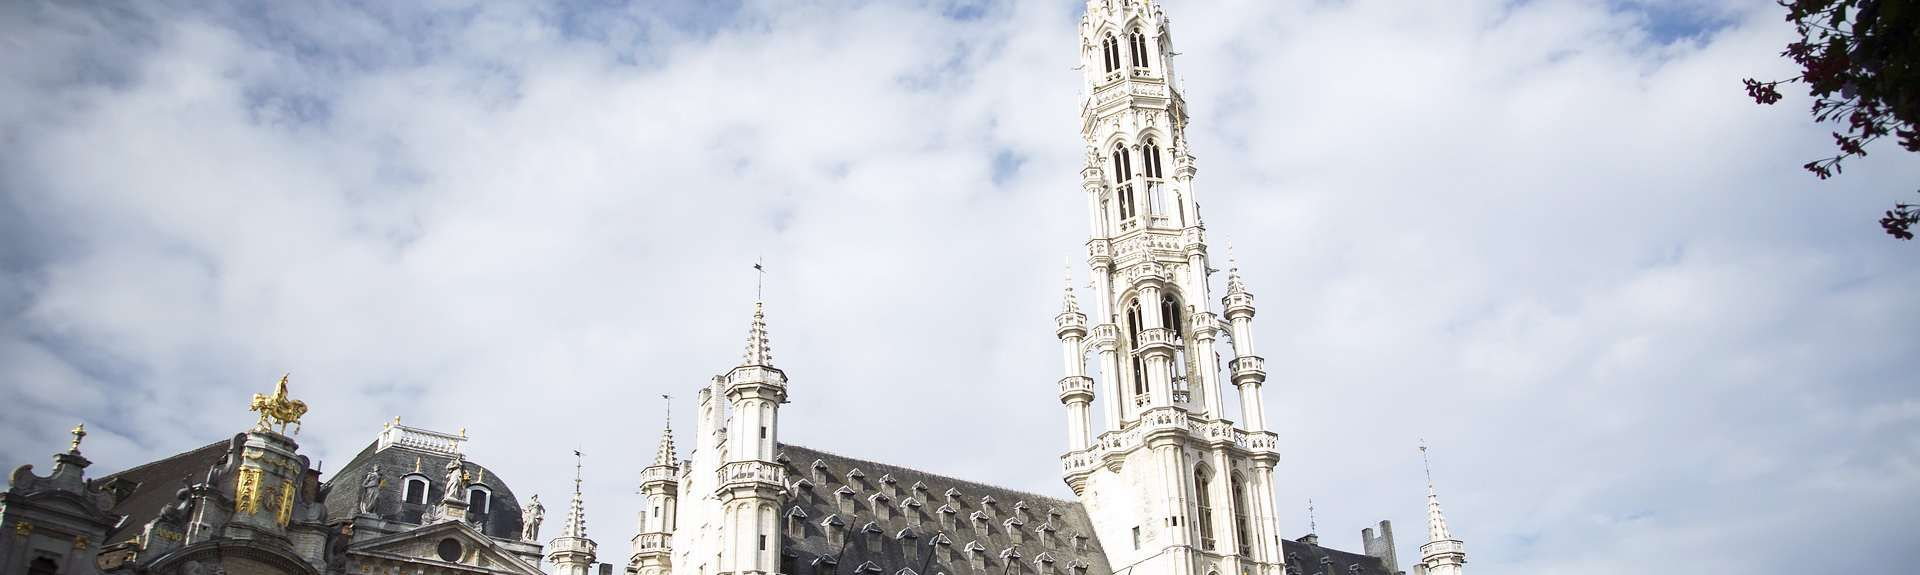 Anneessens, Brussel, Brussels Hoofdstedelijk Gewest, België